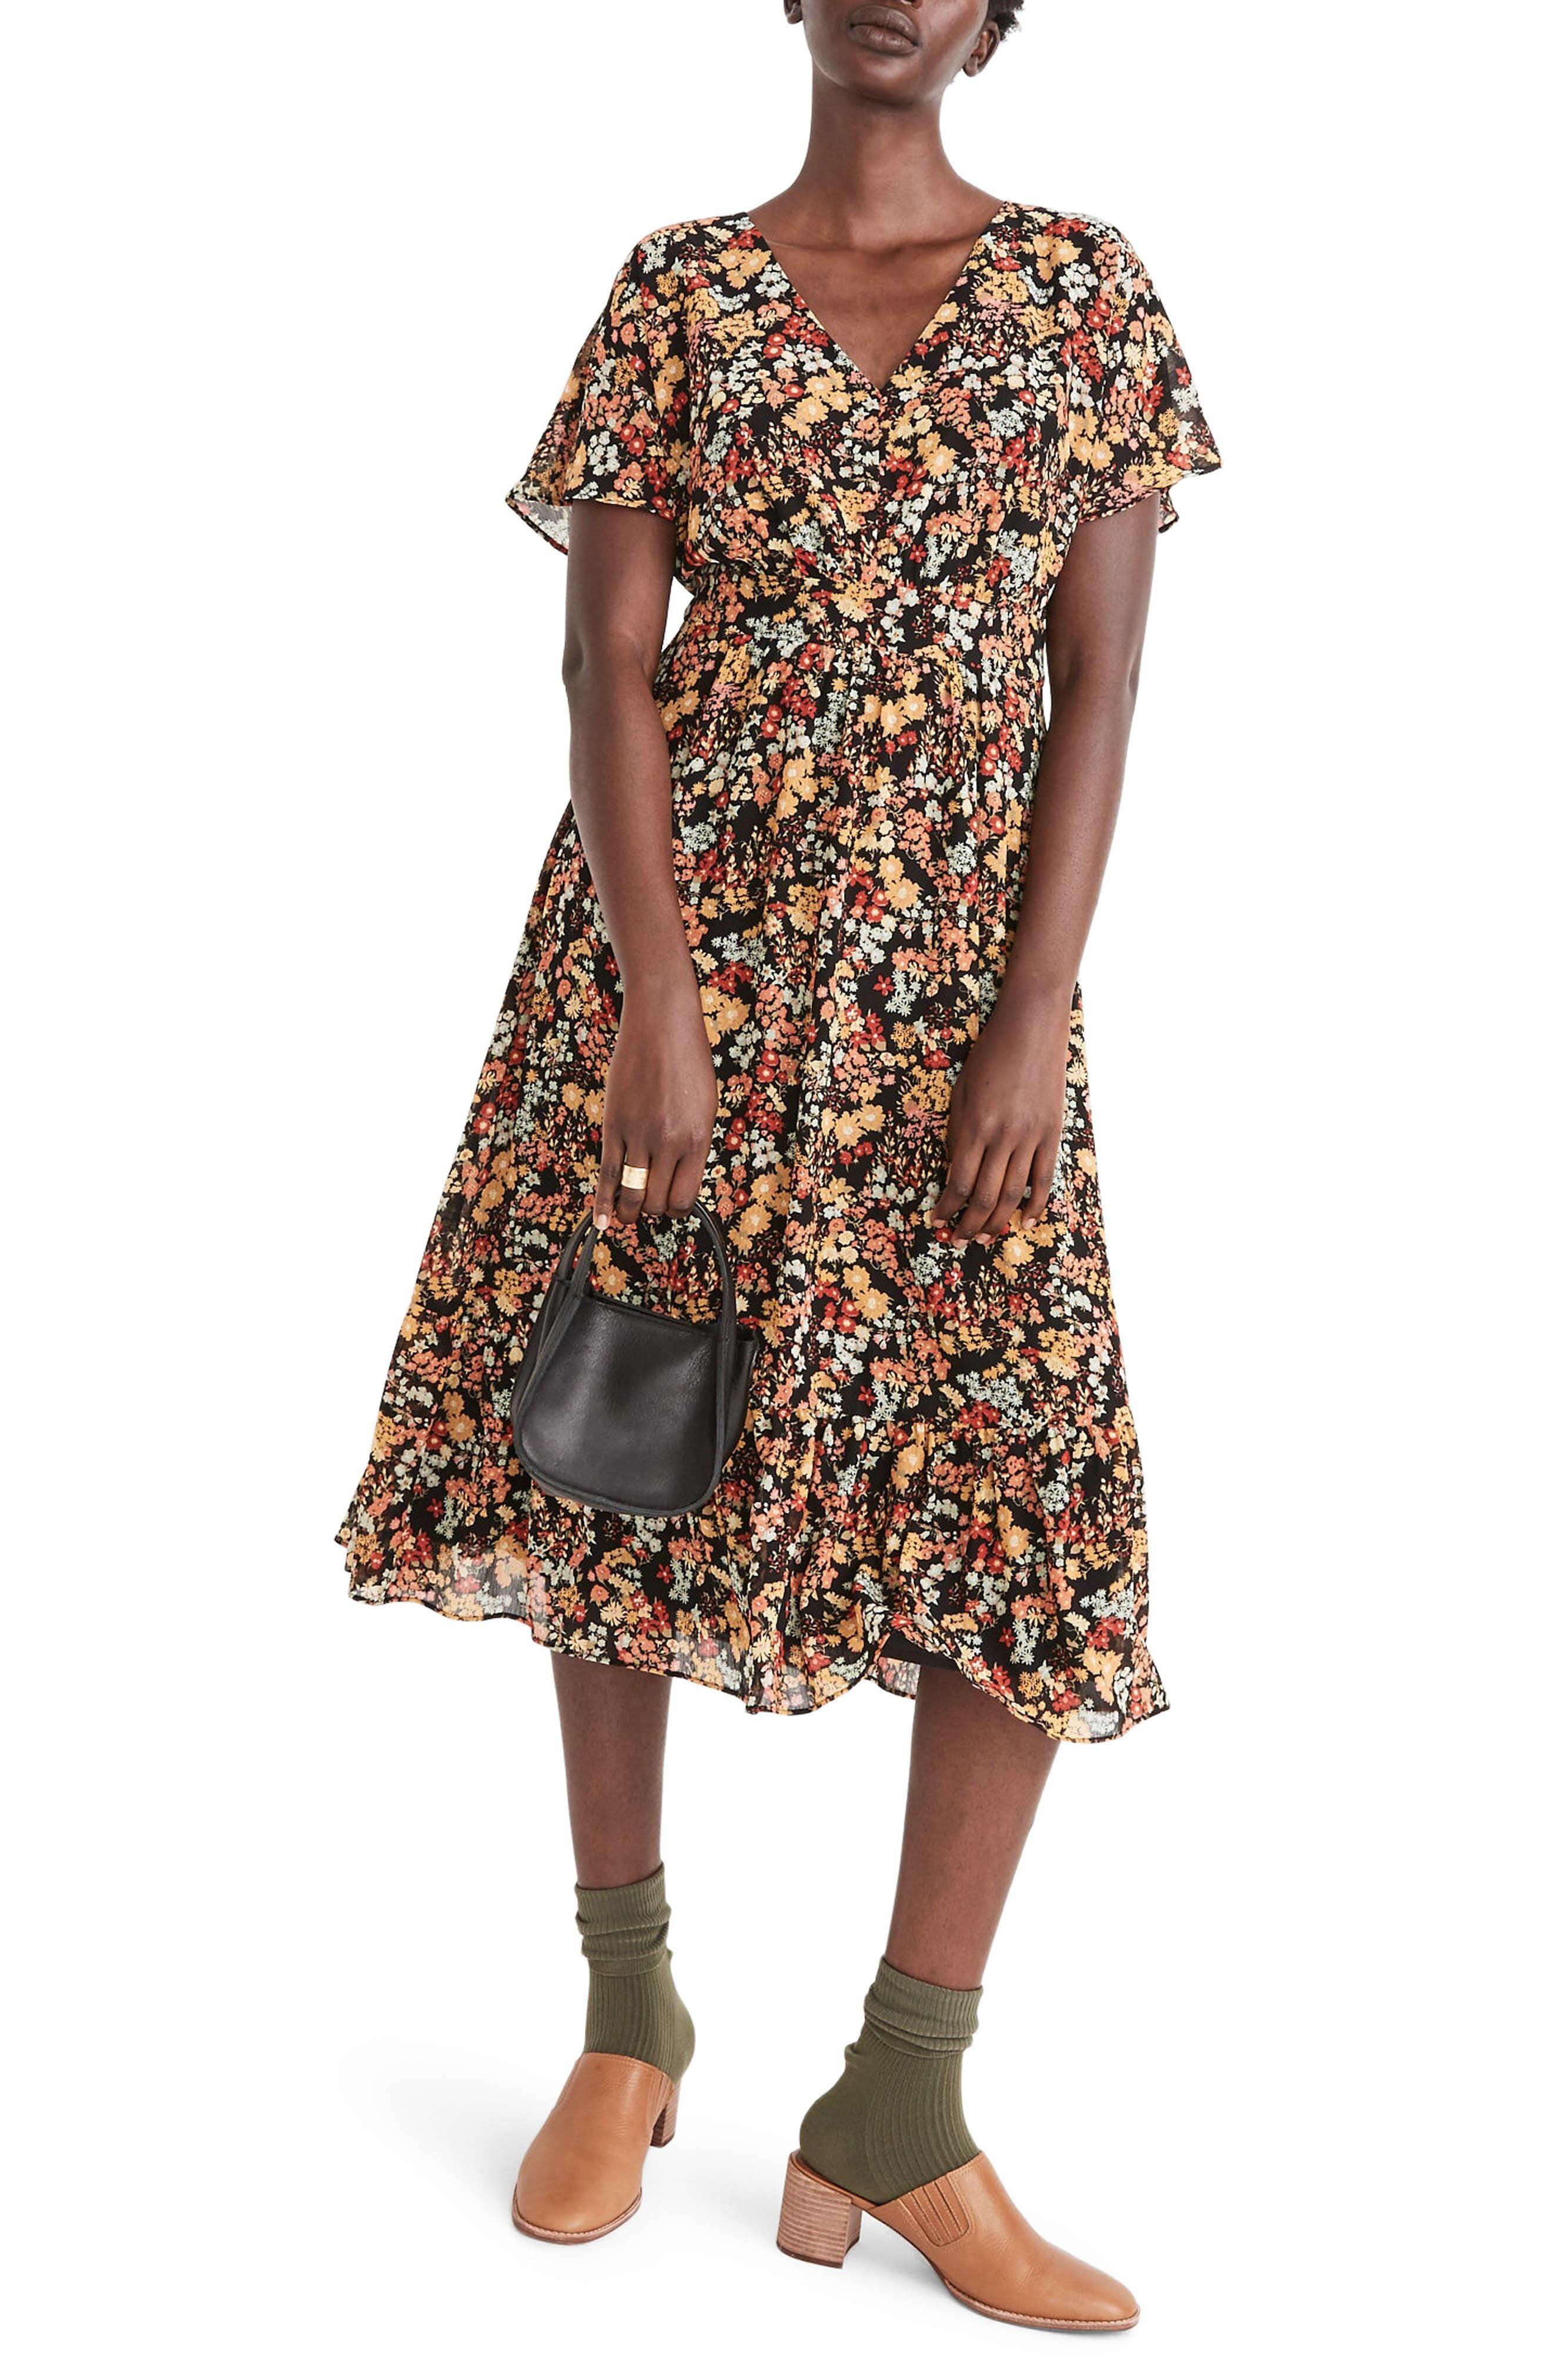 Madewell Women's Madewell Flower Garden Dolman Sleeve Ruffle Hem Midi Dress, Size 10 - Black